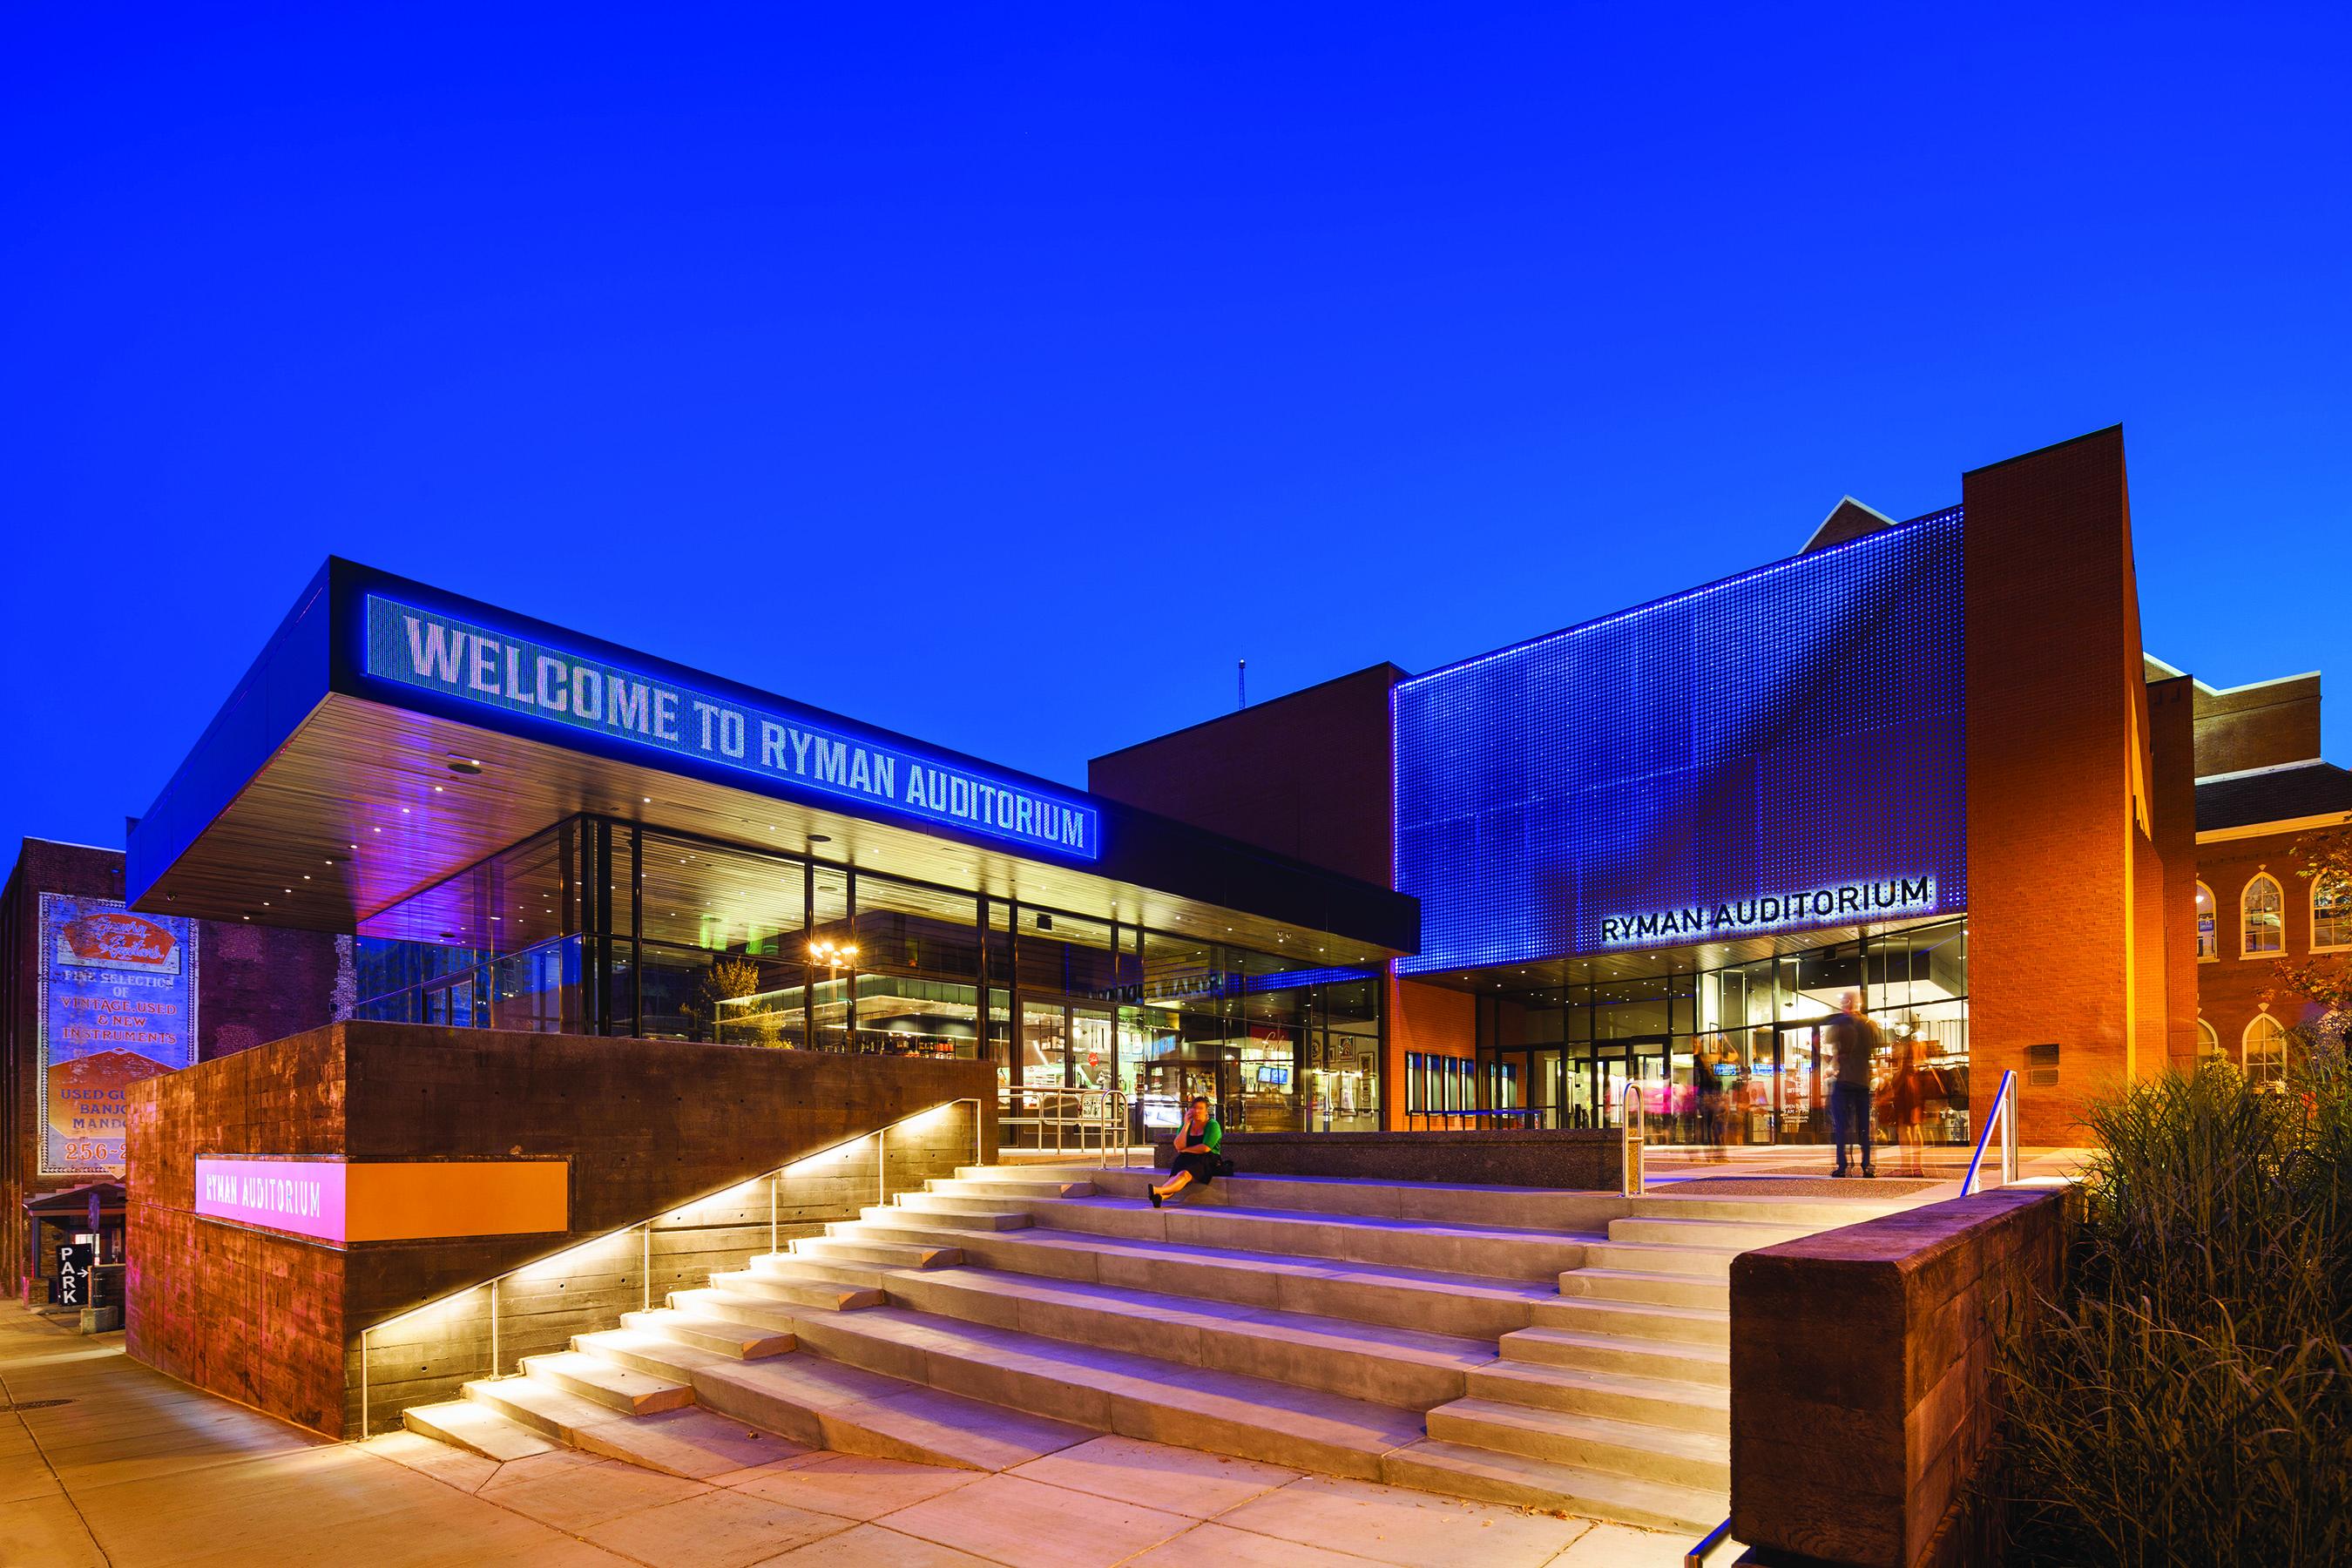 Ryman Auditorium, Location: Nashville TN, Architect: Hastings Architecture Associates